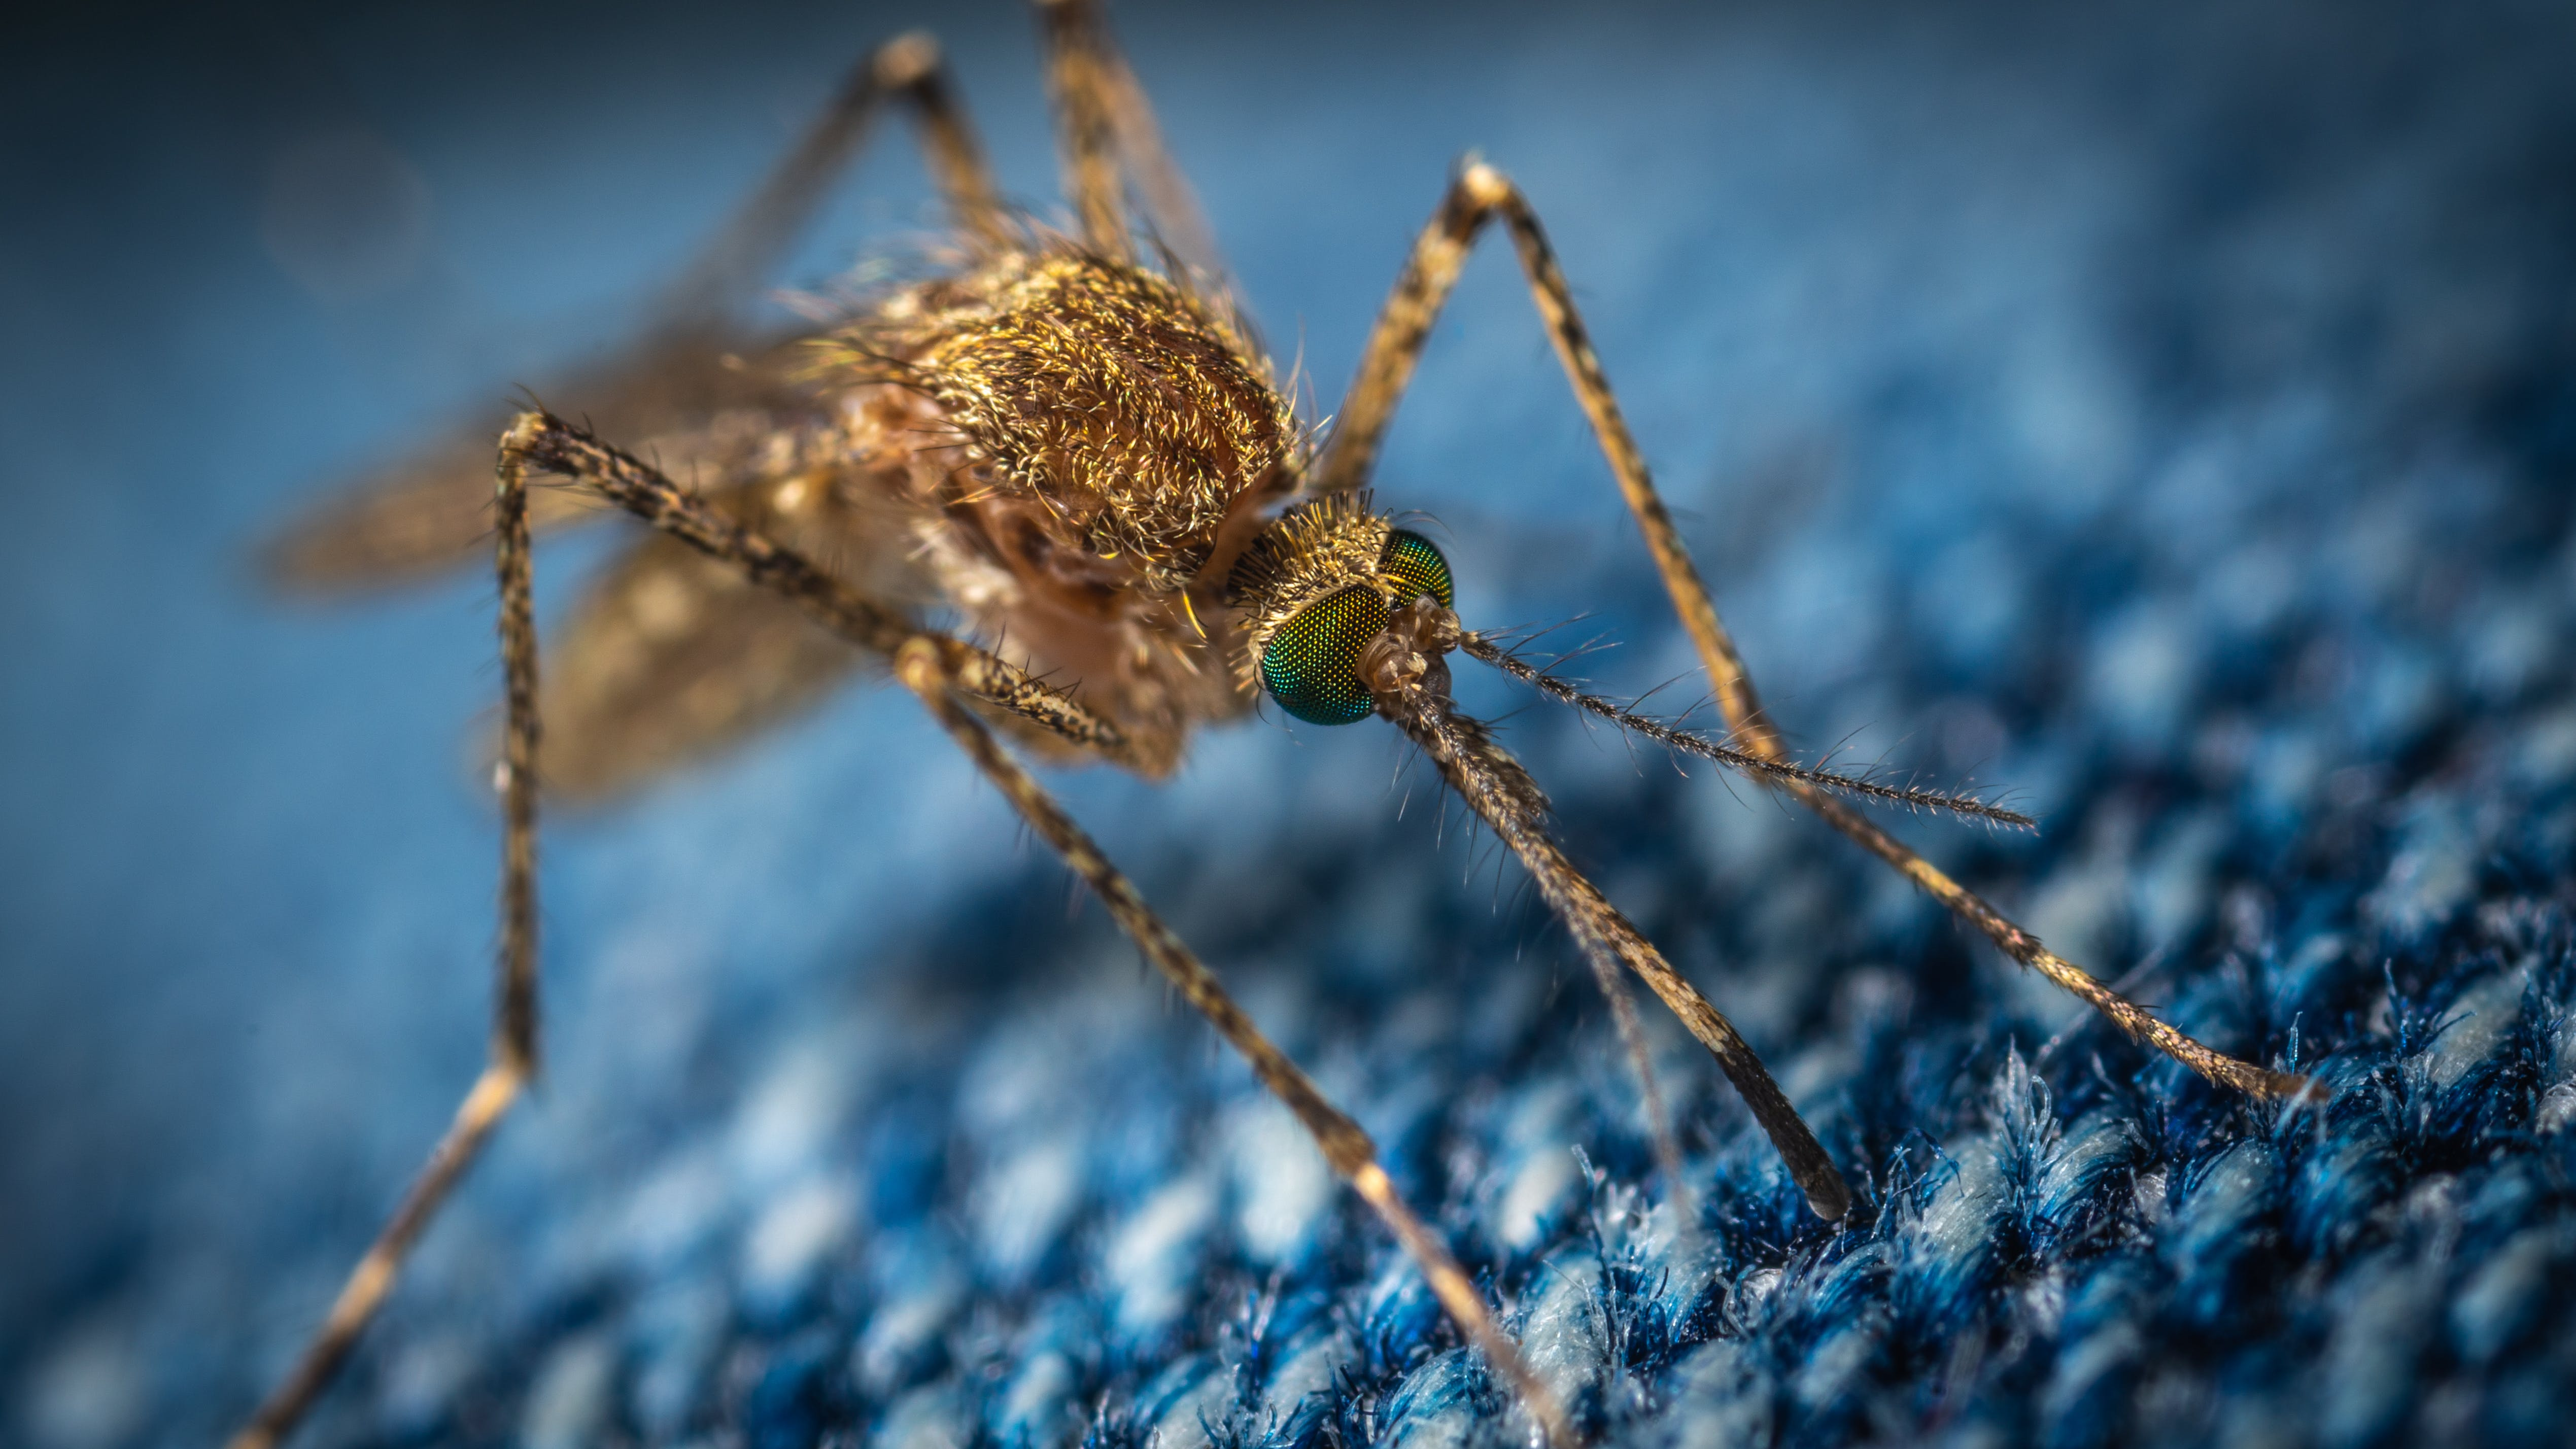 Kostenloses Stock Foto zu entomologie, insekt, makrofotografie, moskito